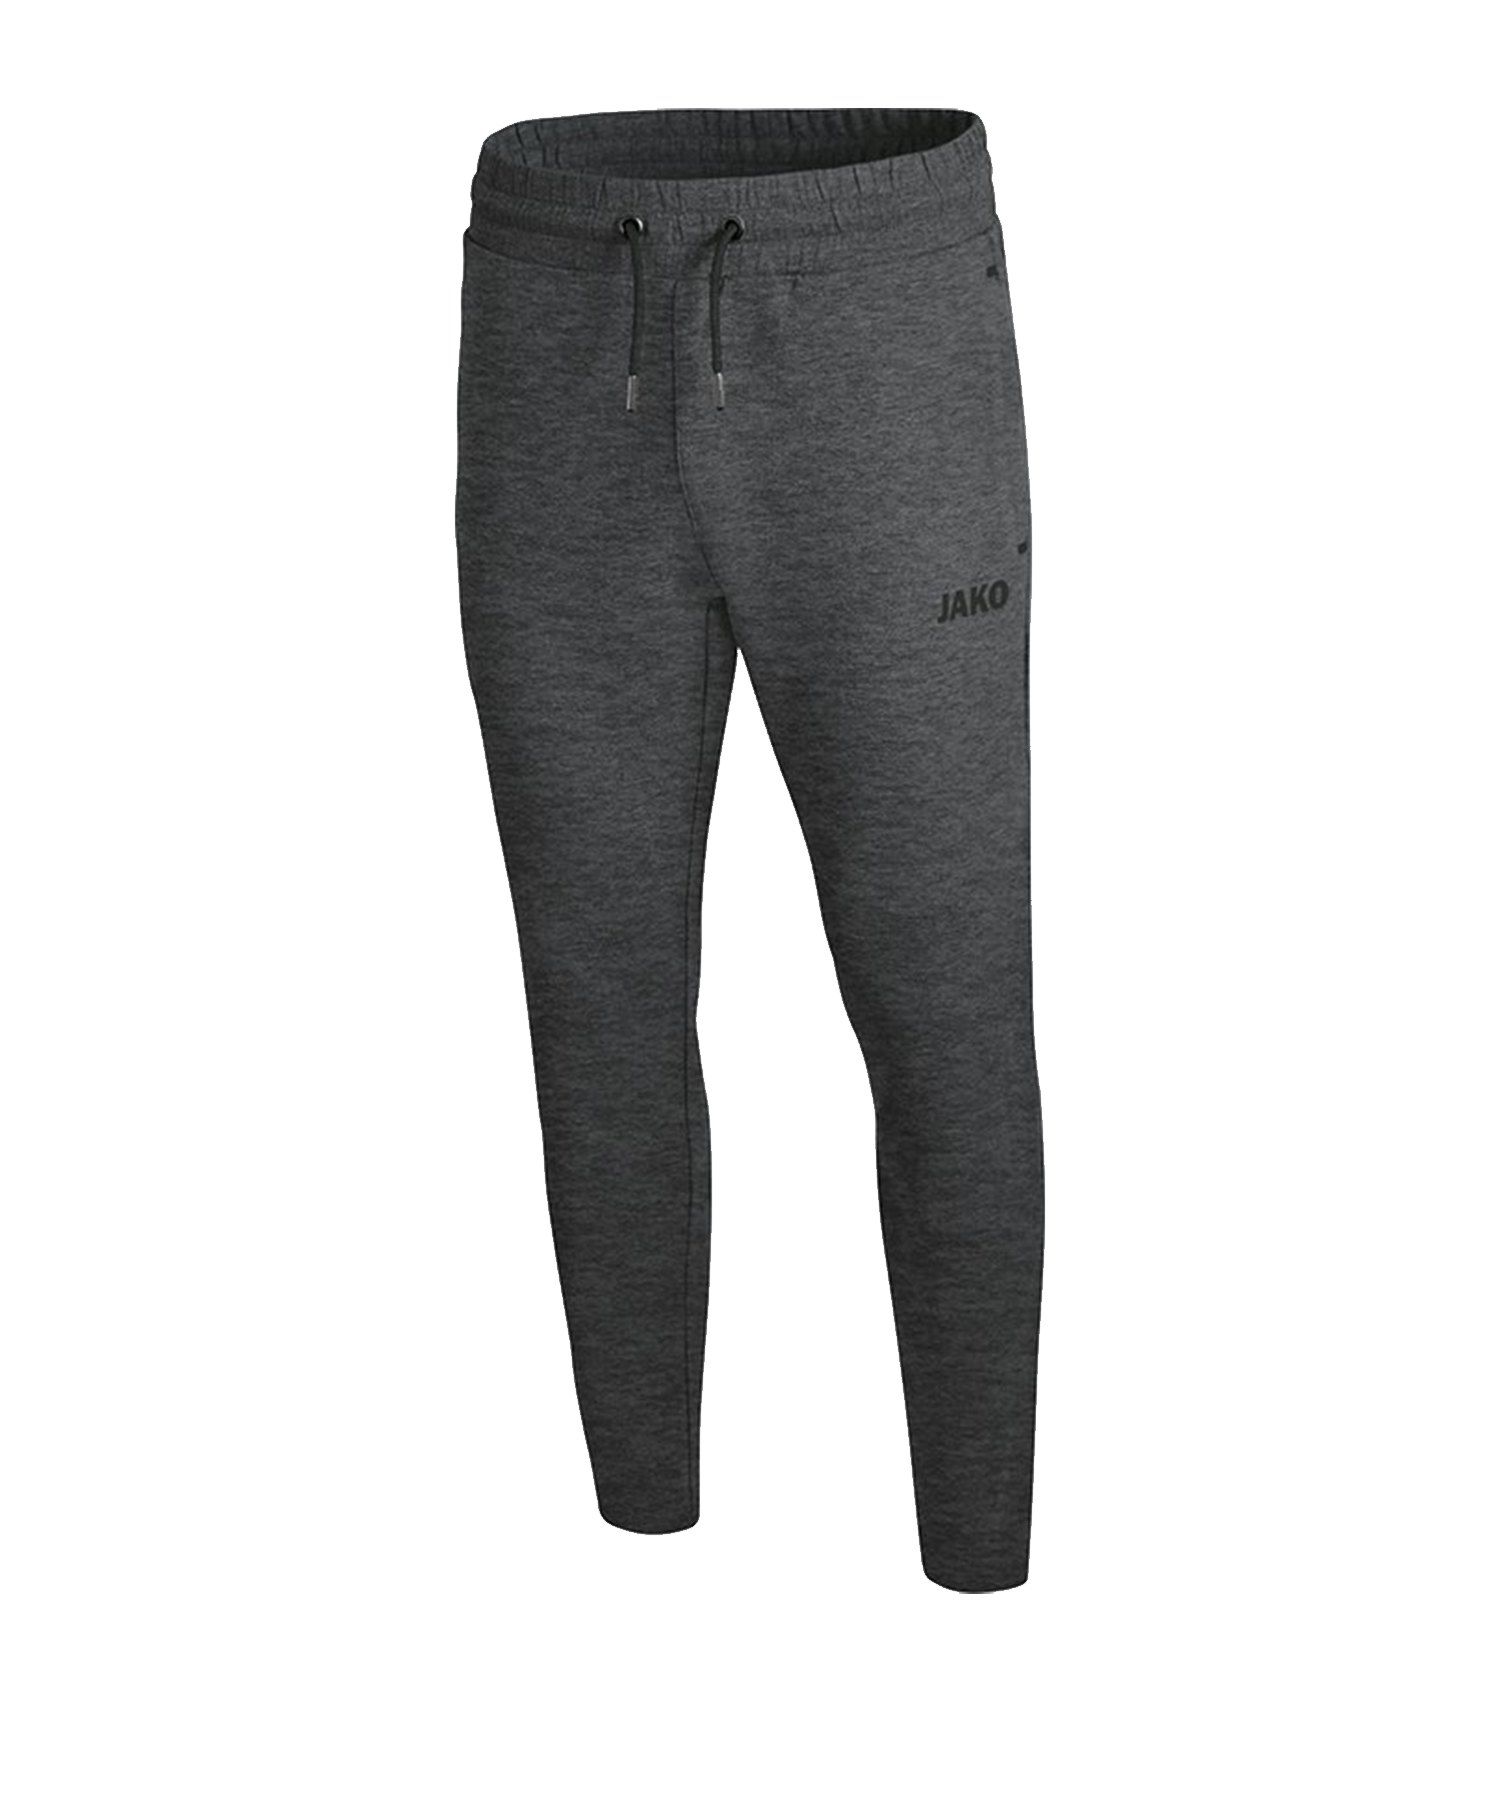 Jako Premium Basic Jogginghose Grau F21 - grau